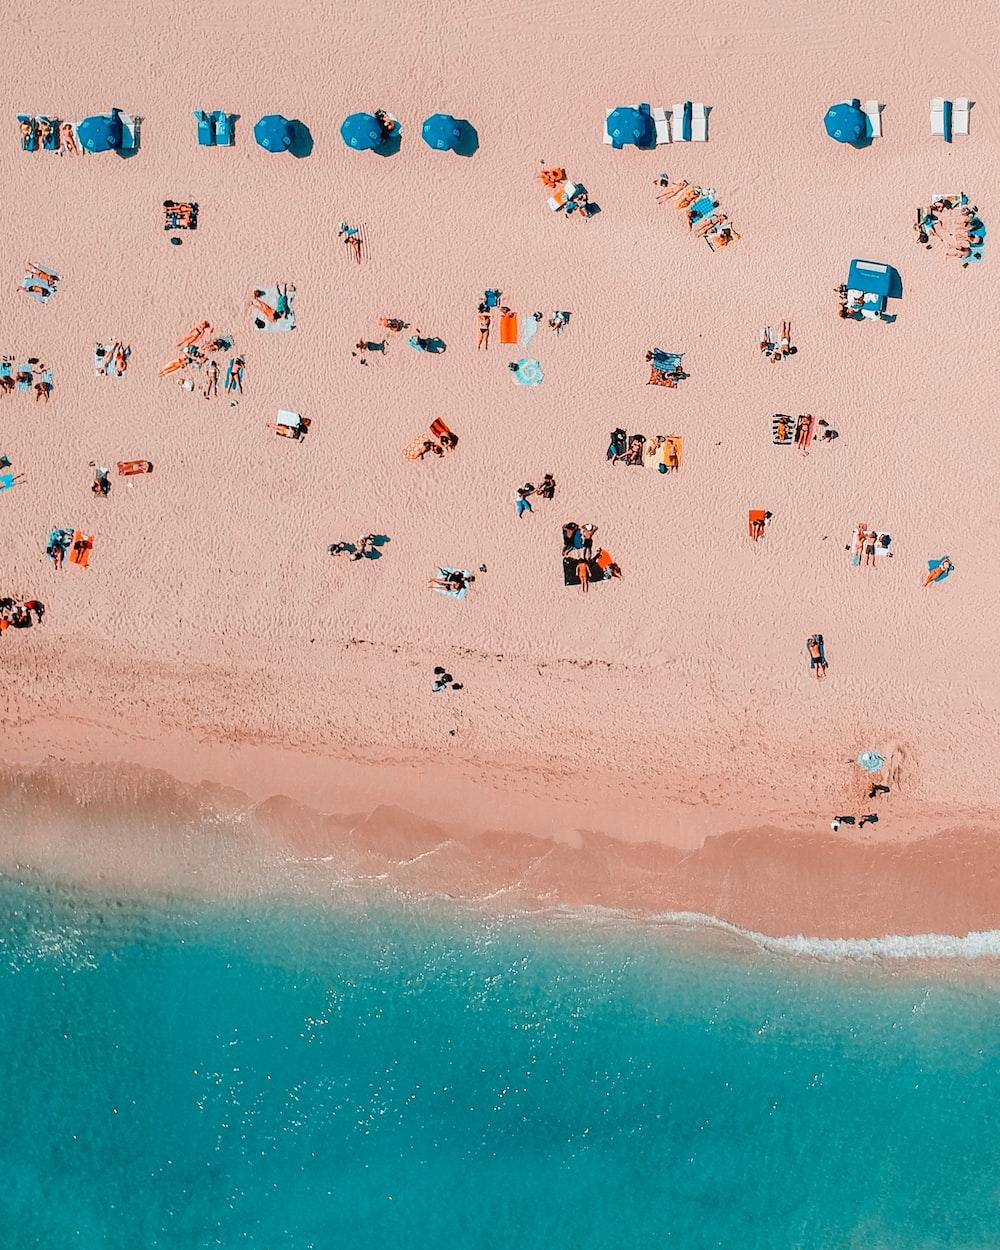 bird's-eye view photography of people in seashore